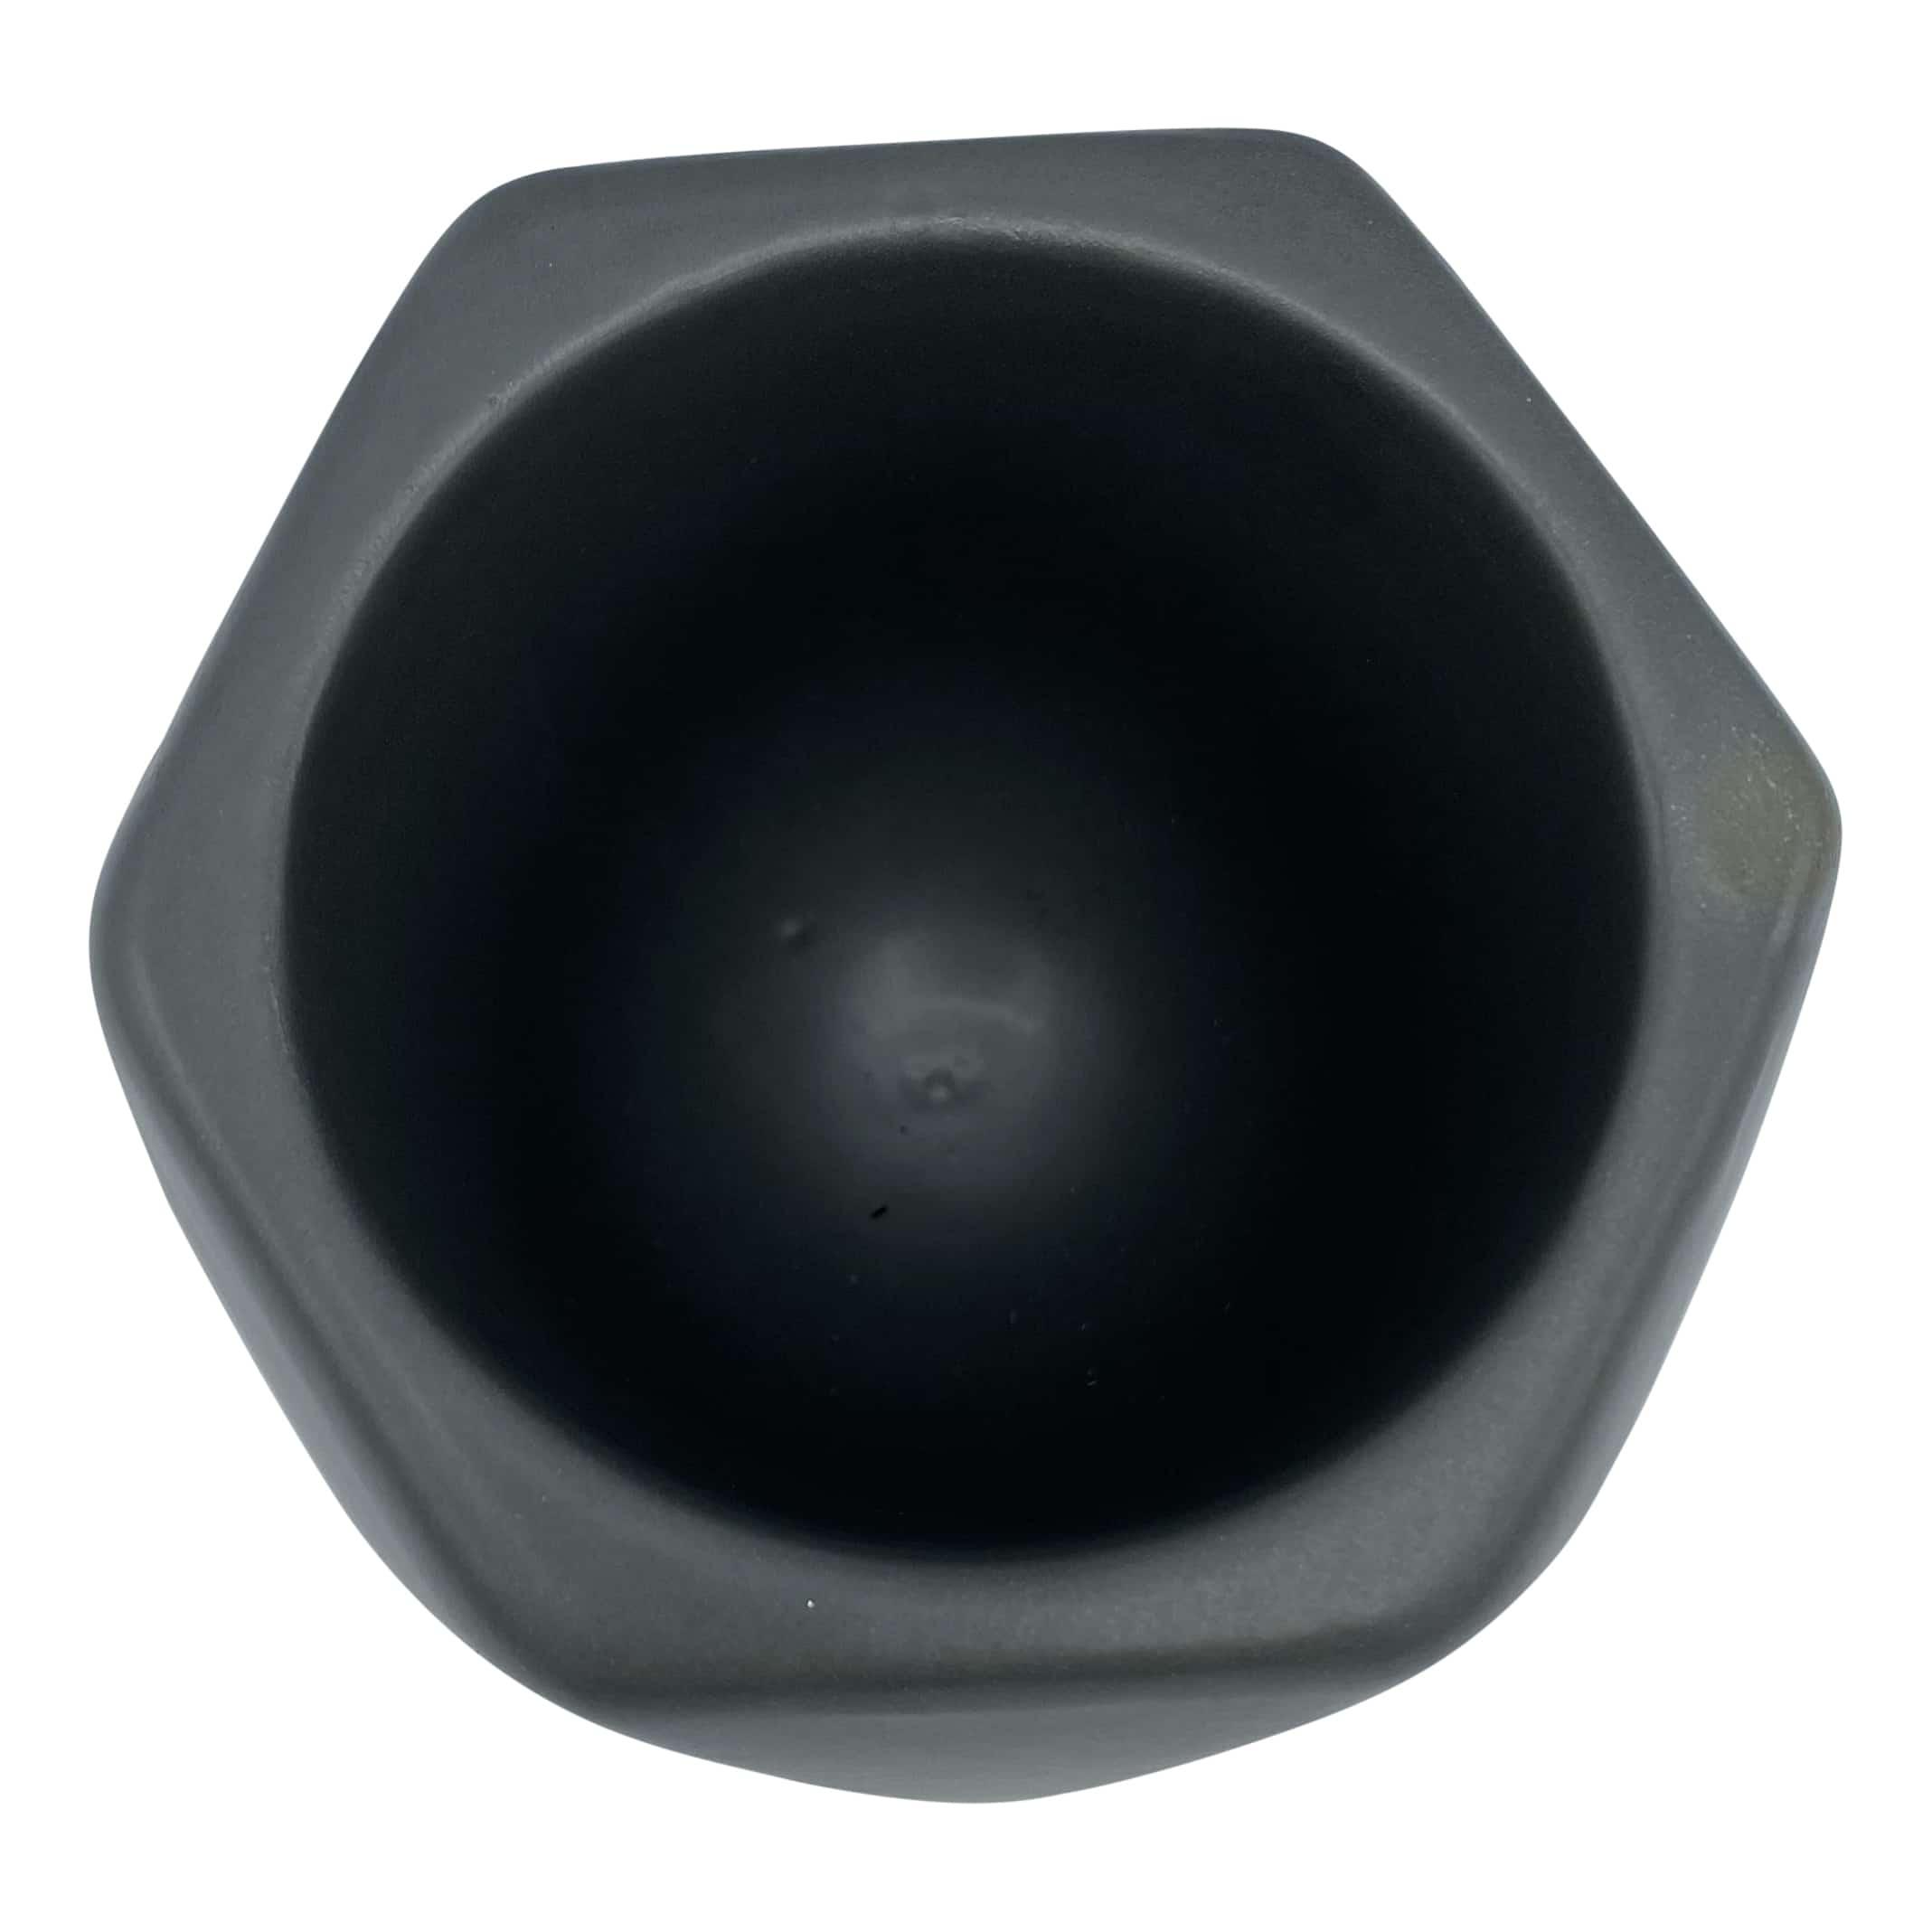 4goodz Diamond keramische toiletborstel - Grijs